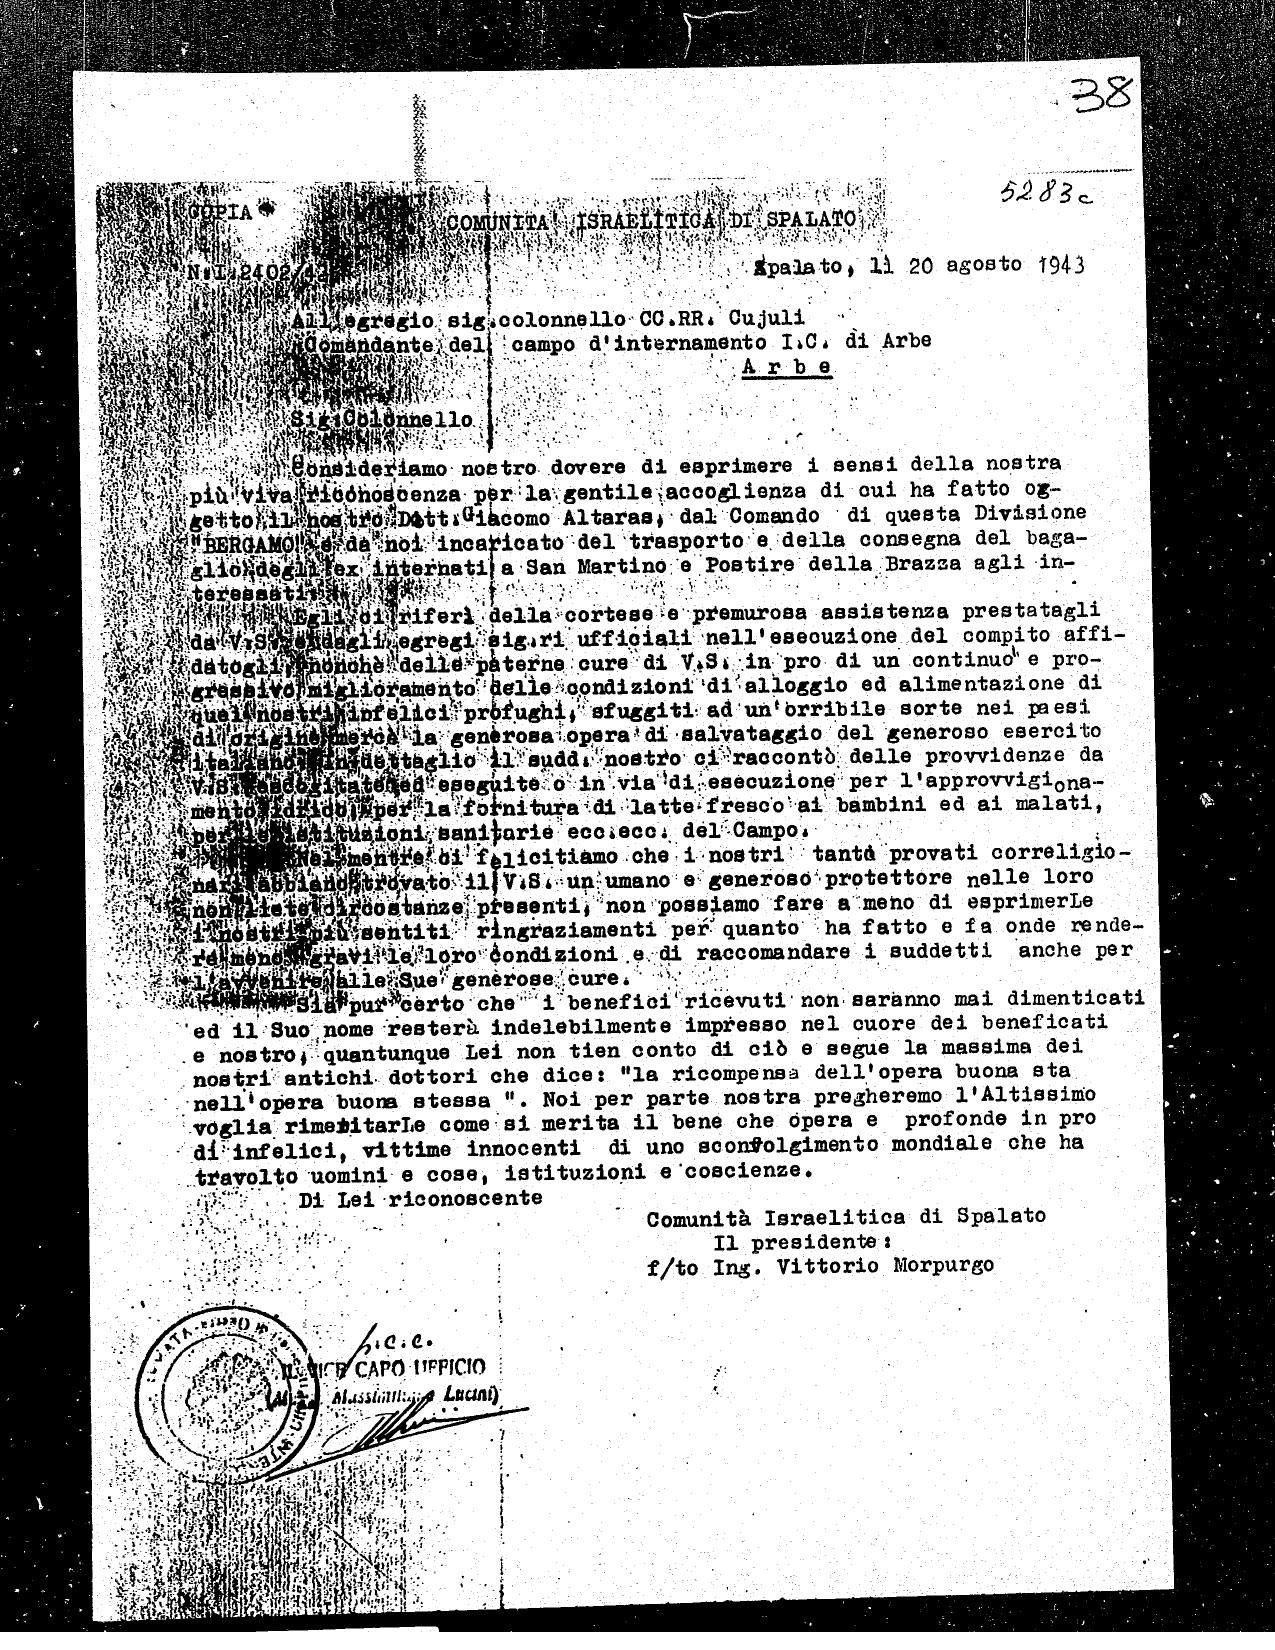 Morpurgo, Vittorio Jewish community of Split letter 1943